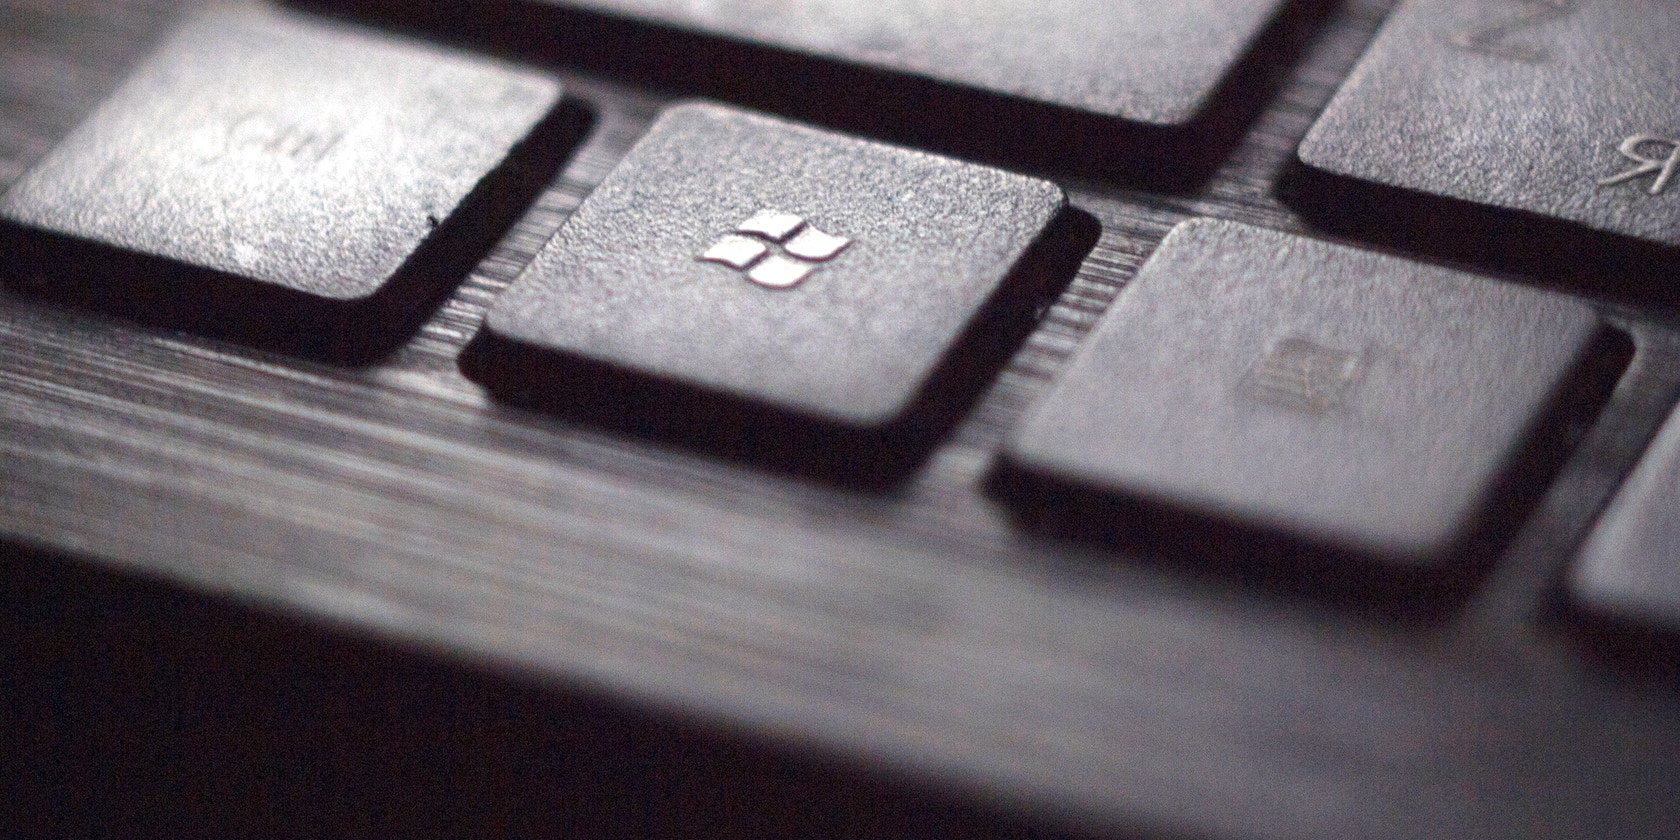 Keyboard with Windows key in focus